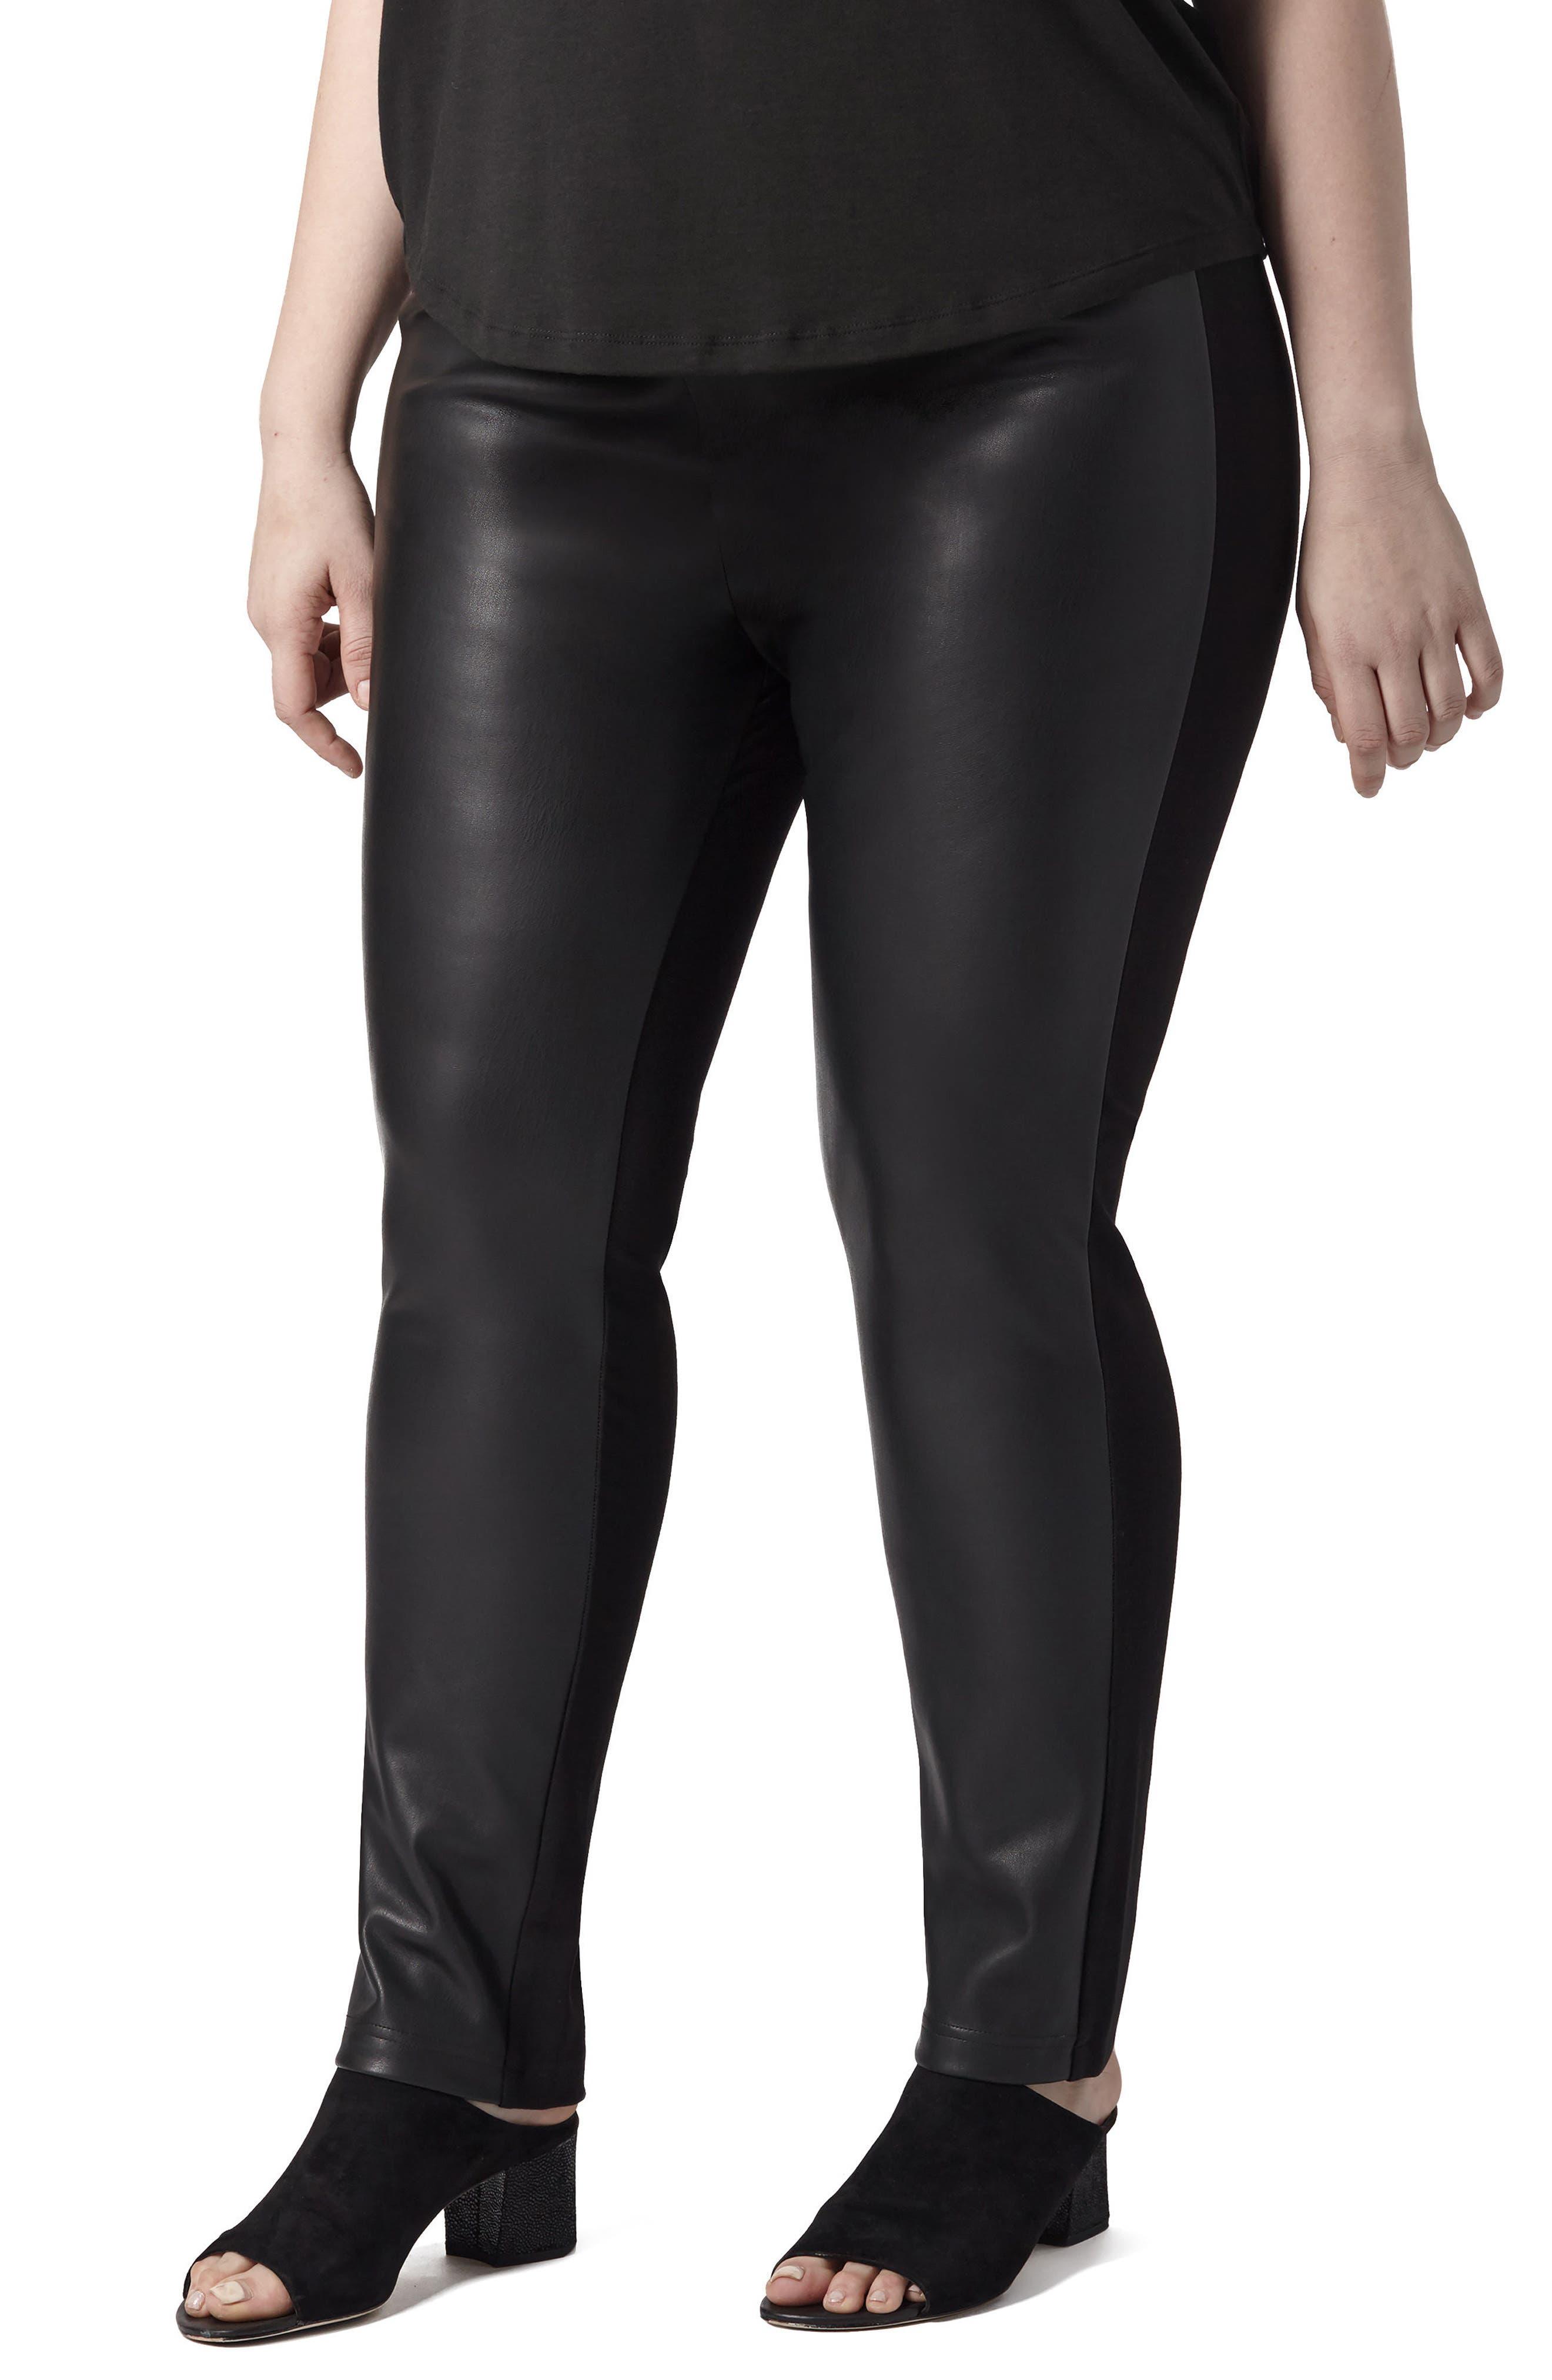 UNIVERSAL STANDARD Potenza Faux Leather Pants (Plus Size)